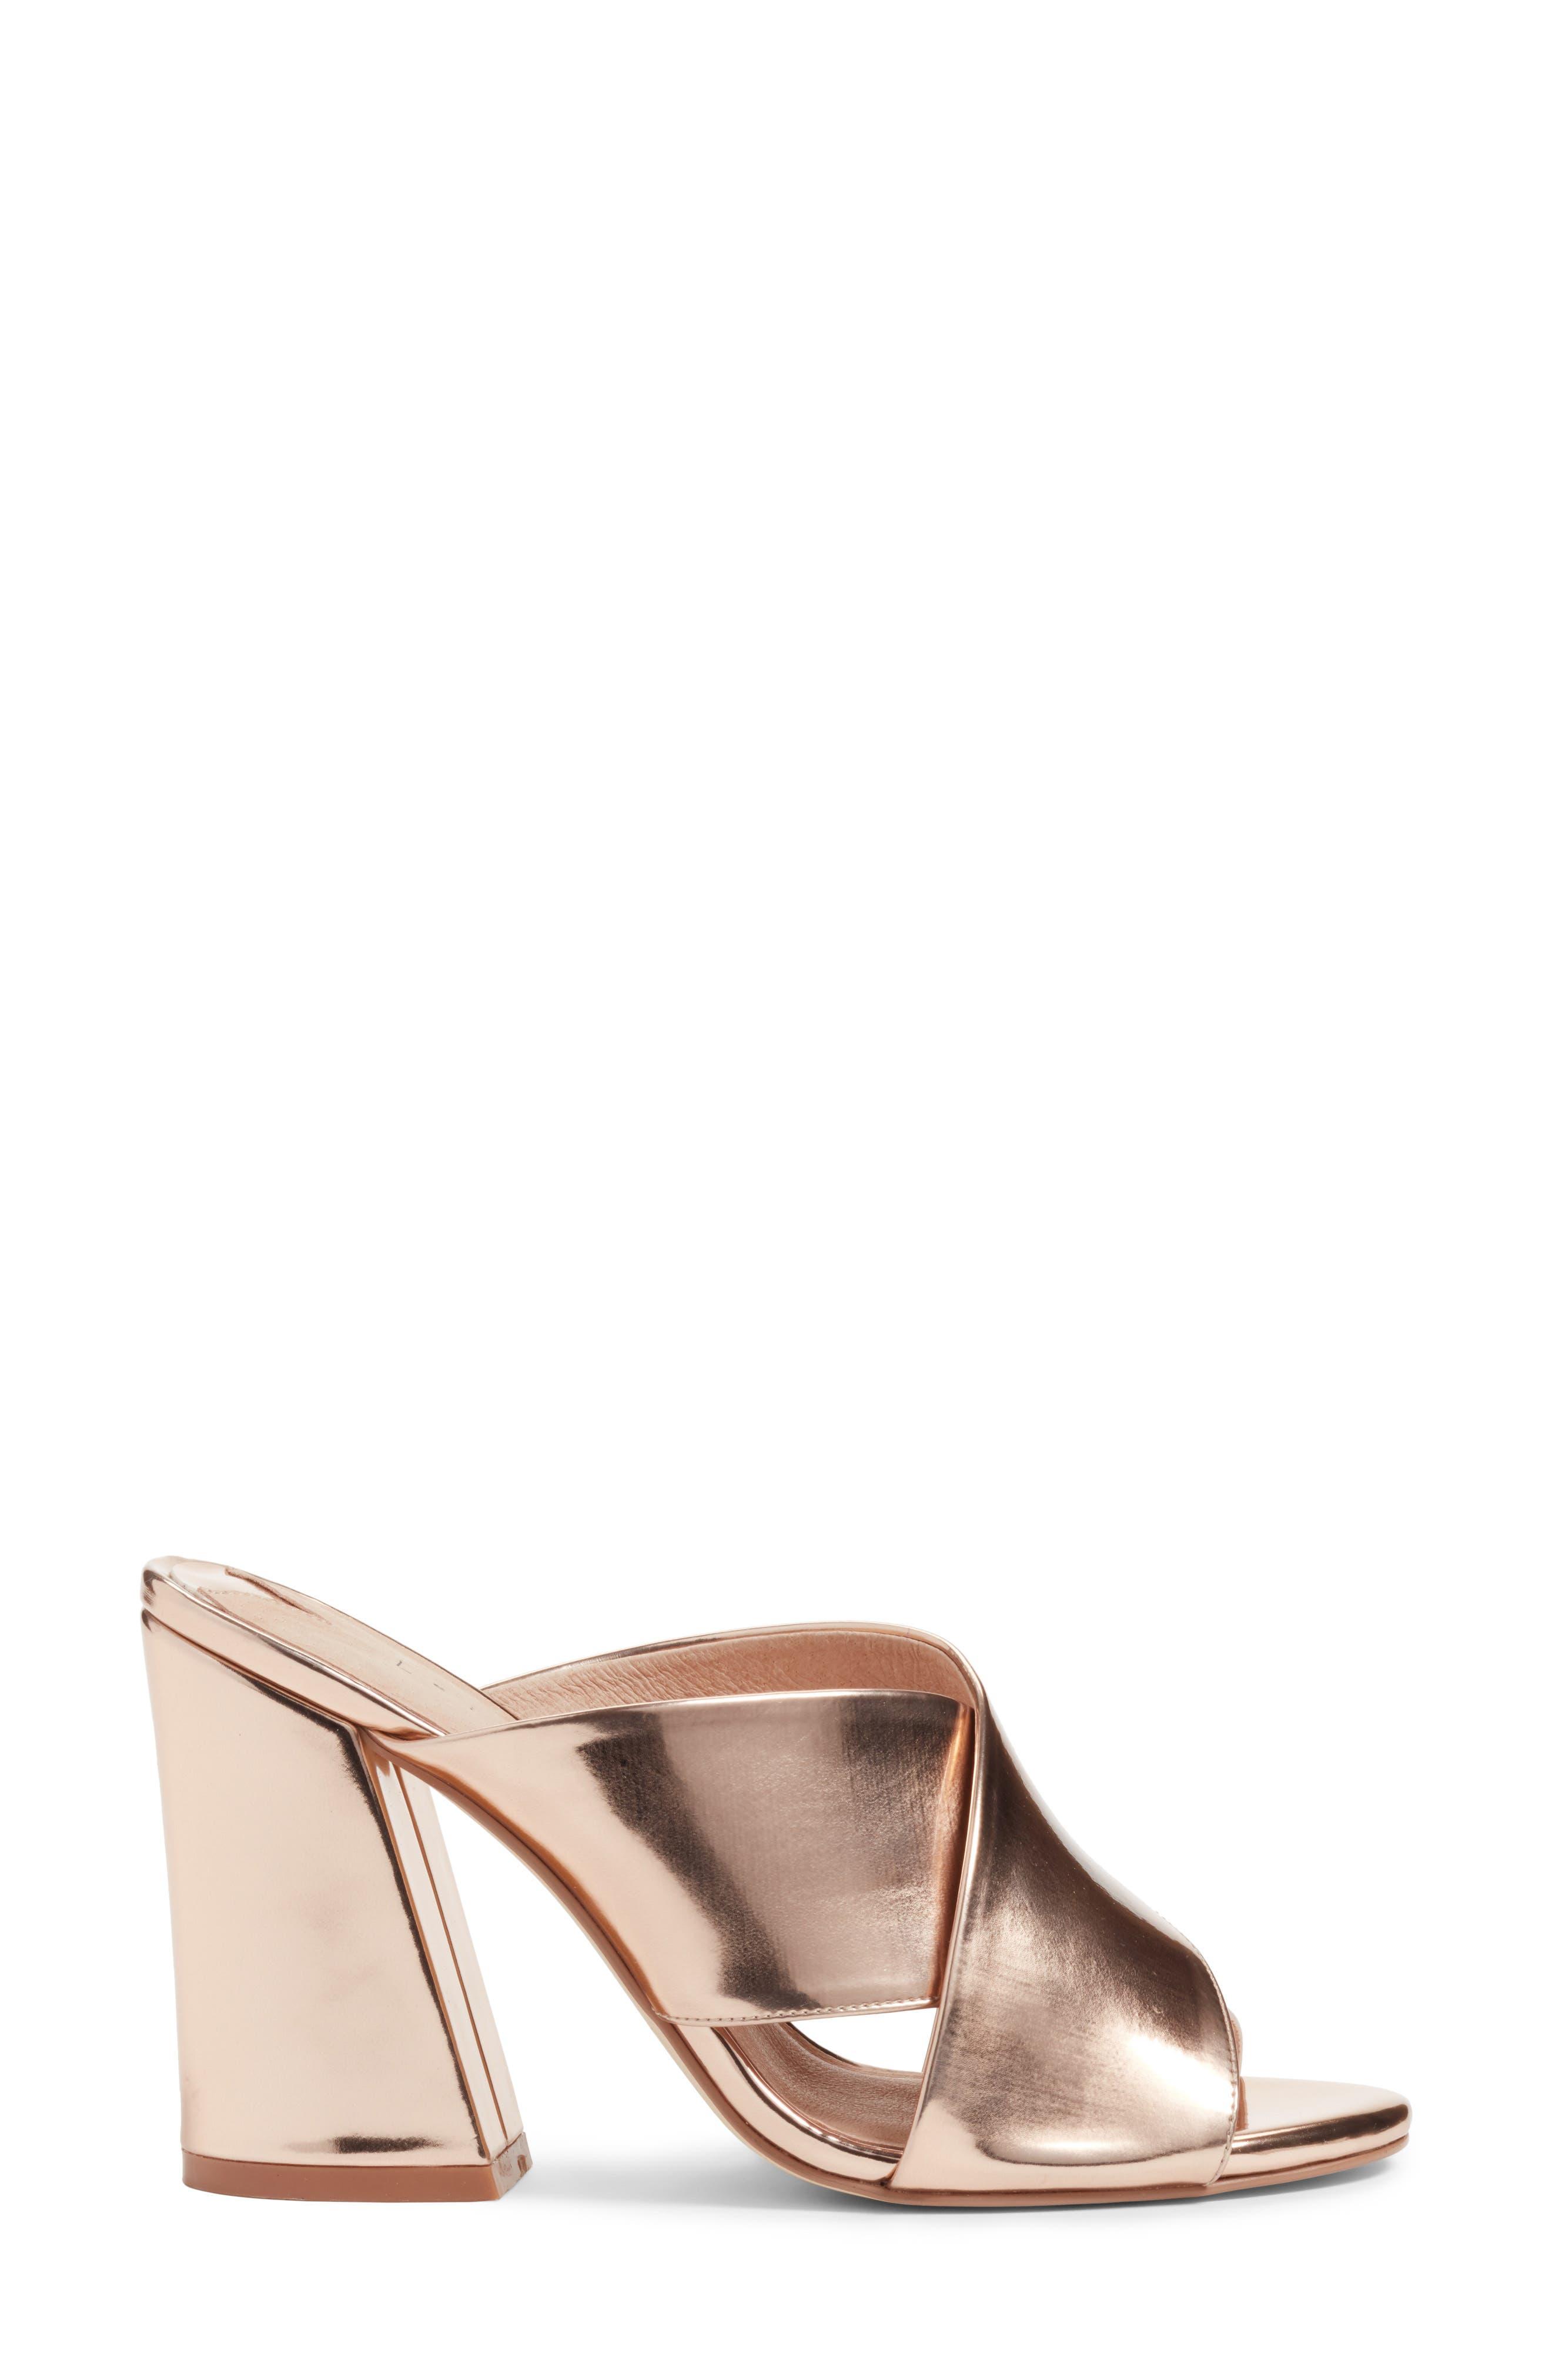 Cammie Block Heel Sandal,                             Alternate thumbnail 3, color,                             659